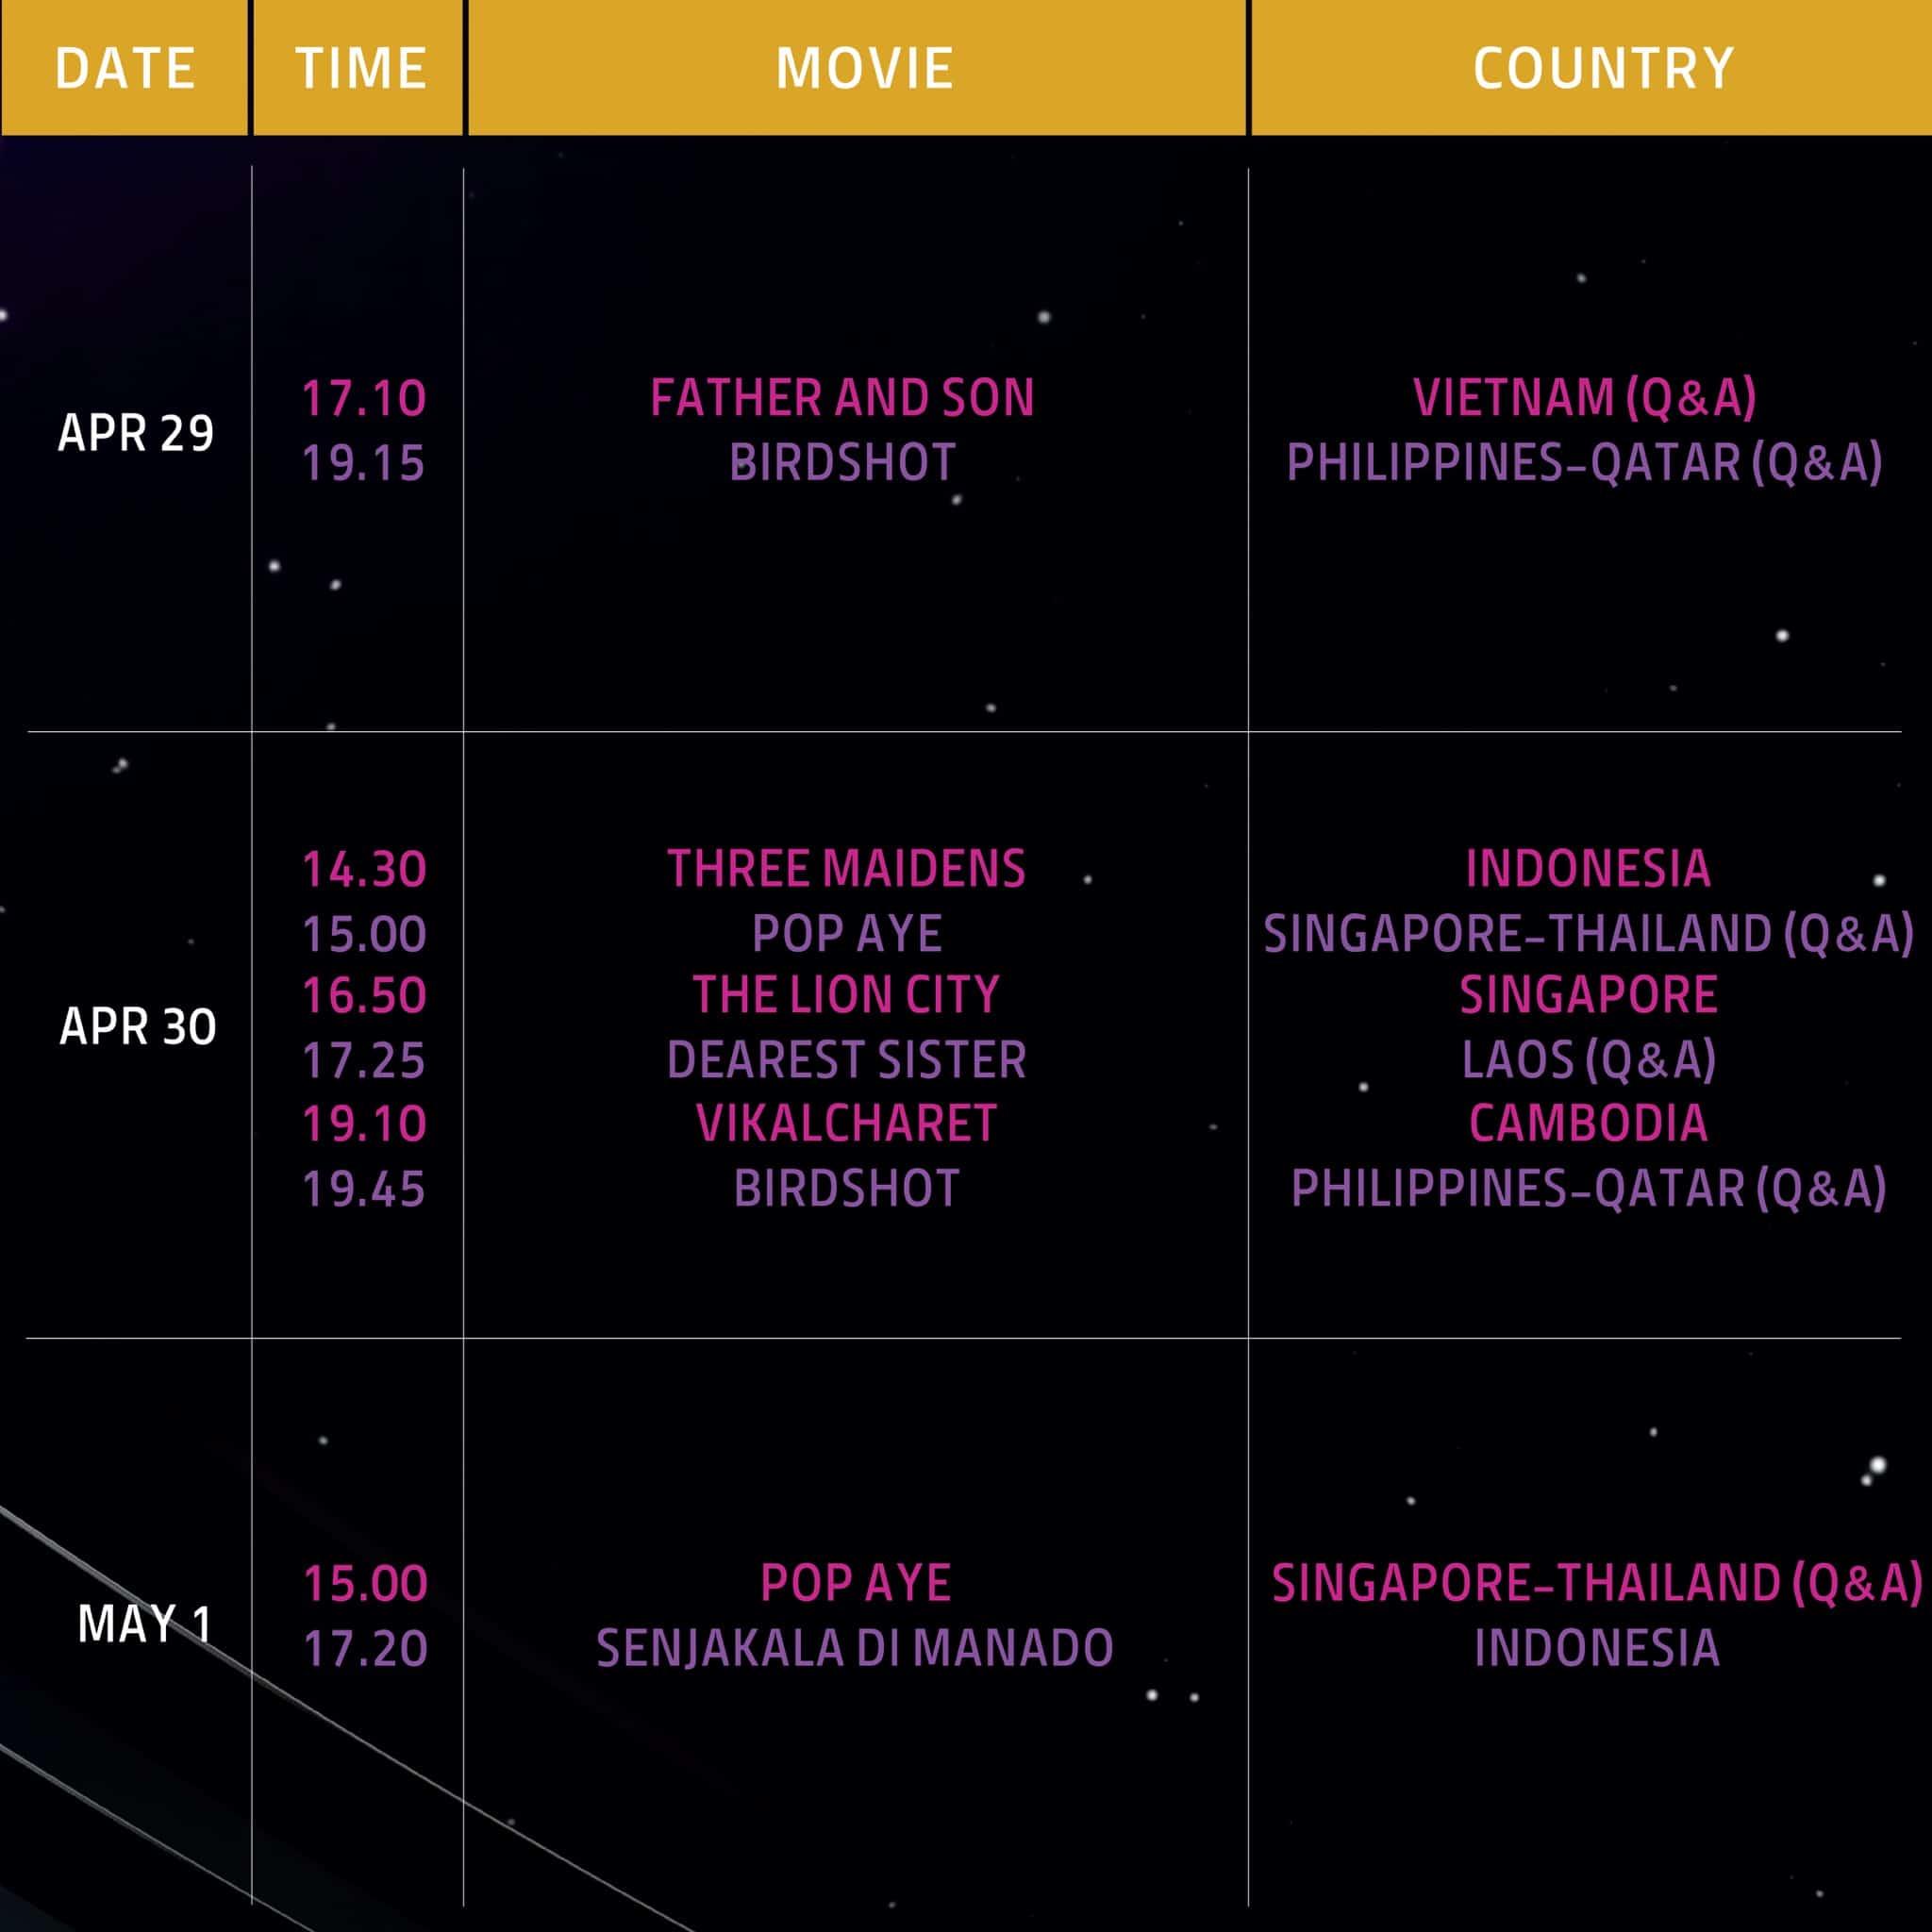 bangkok-ASEAN-film-festival-14